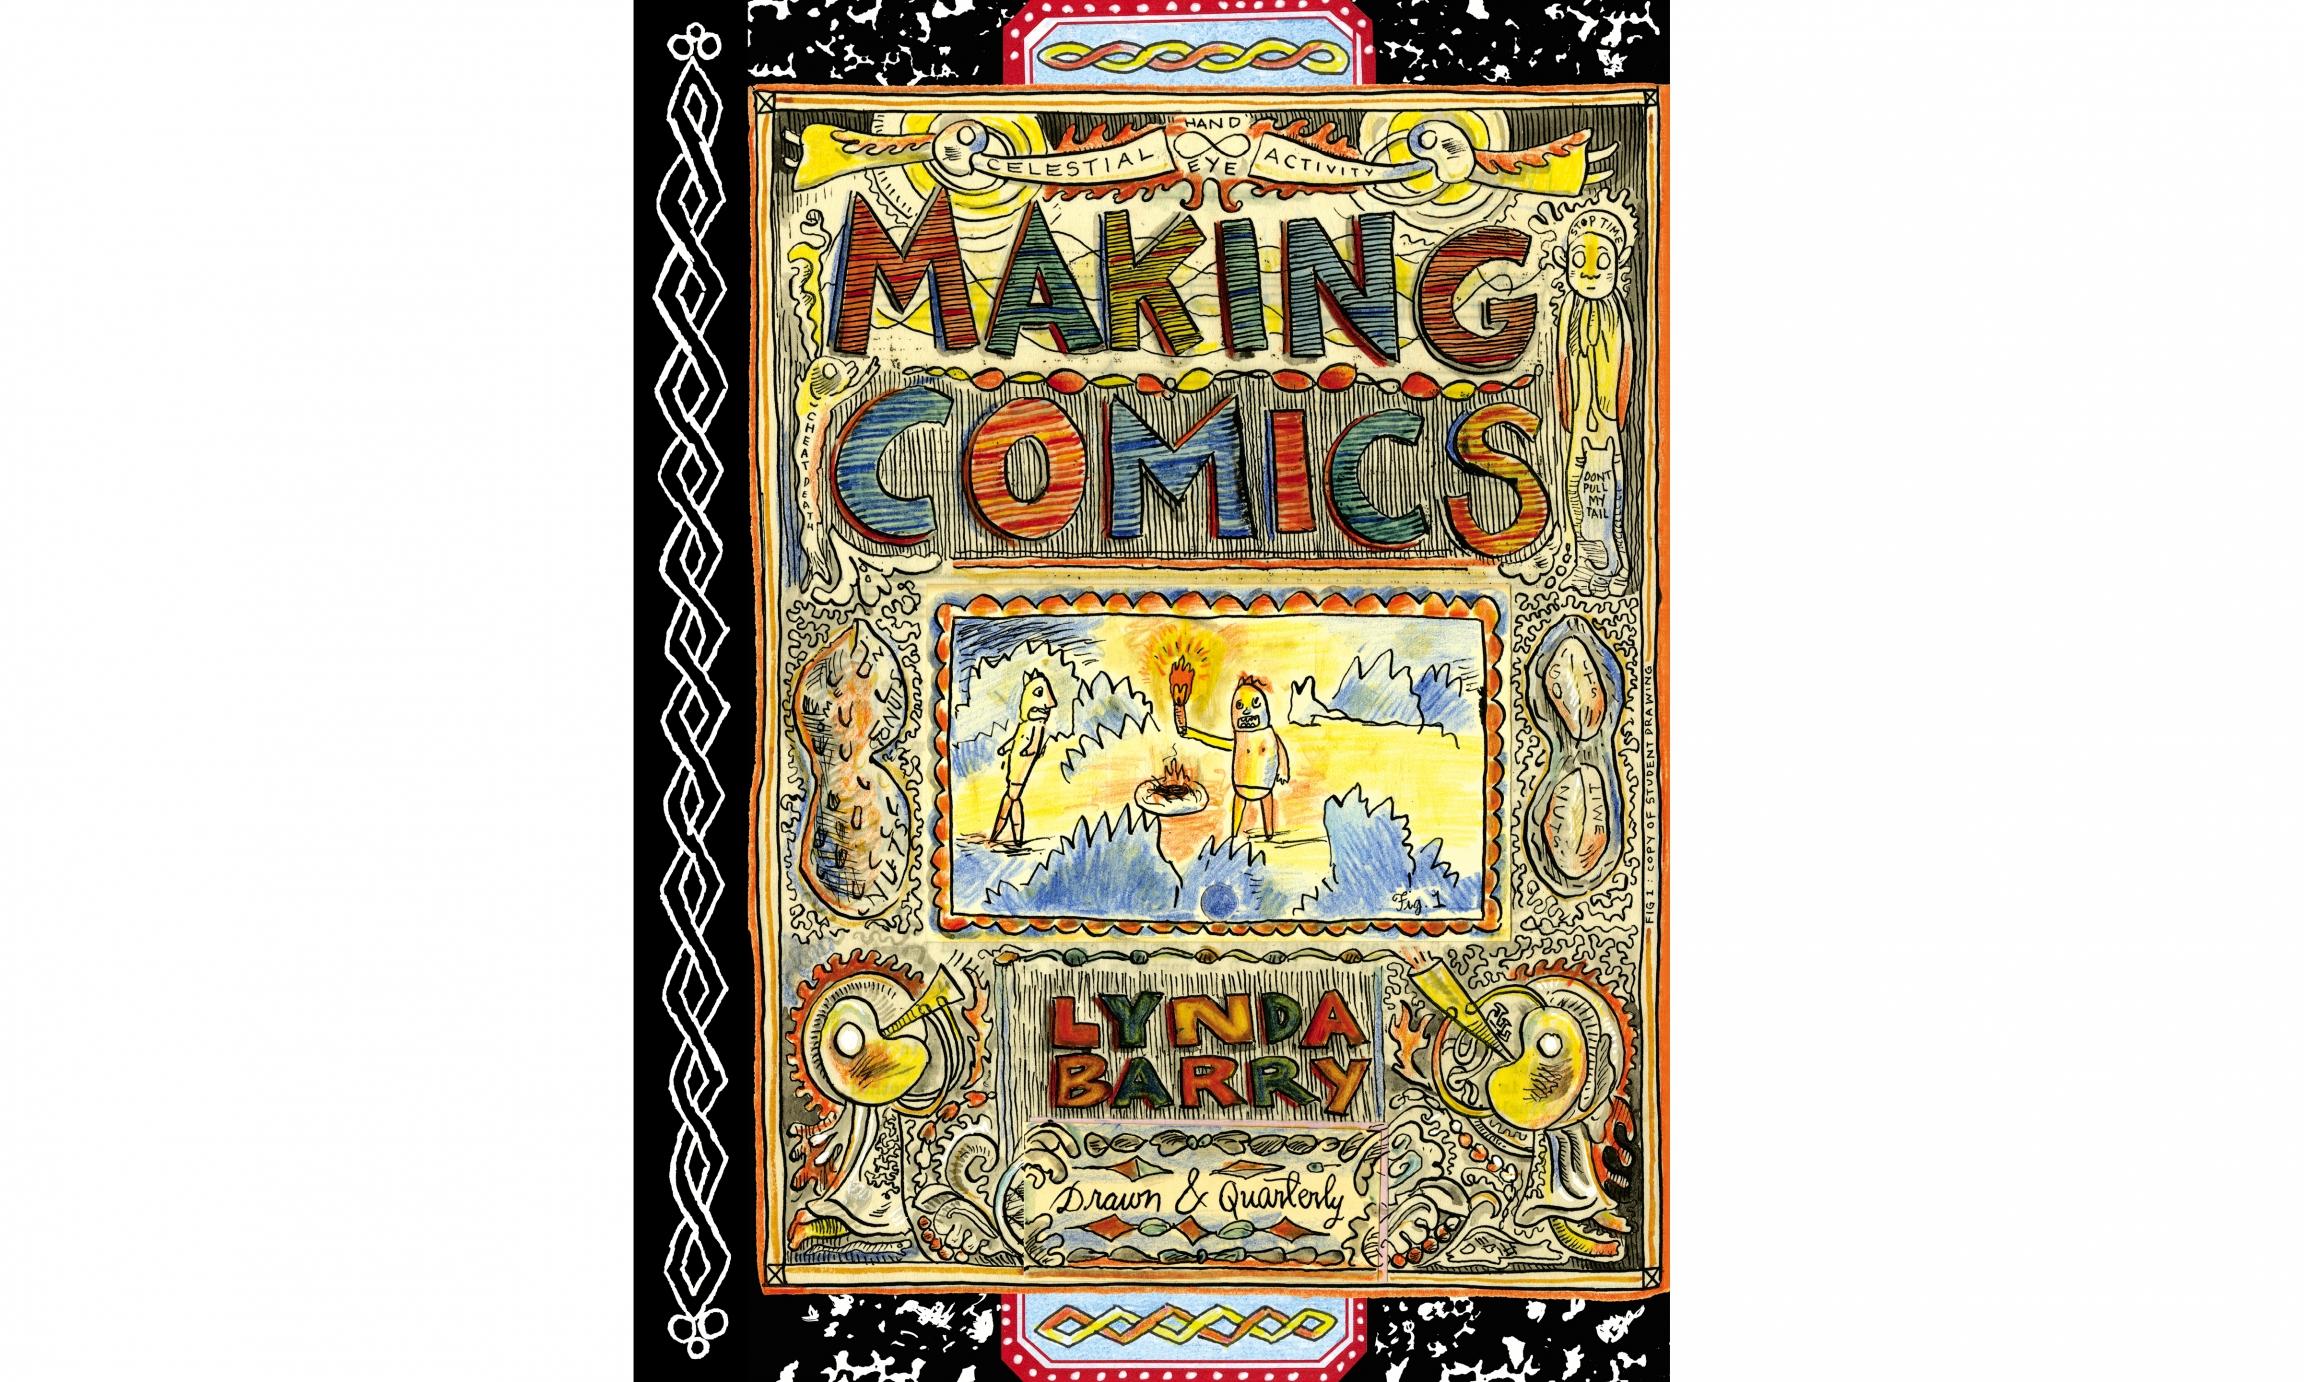 """Making Comics"" by Lynda Barry"